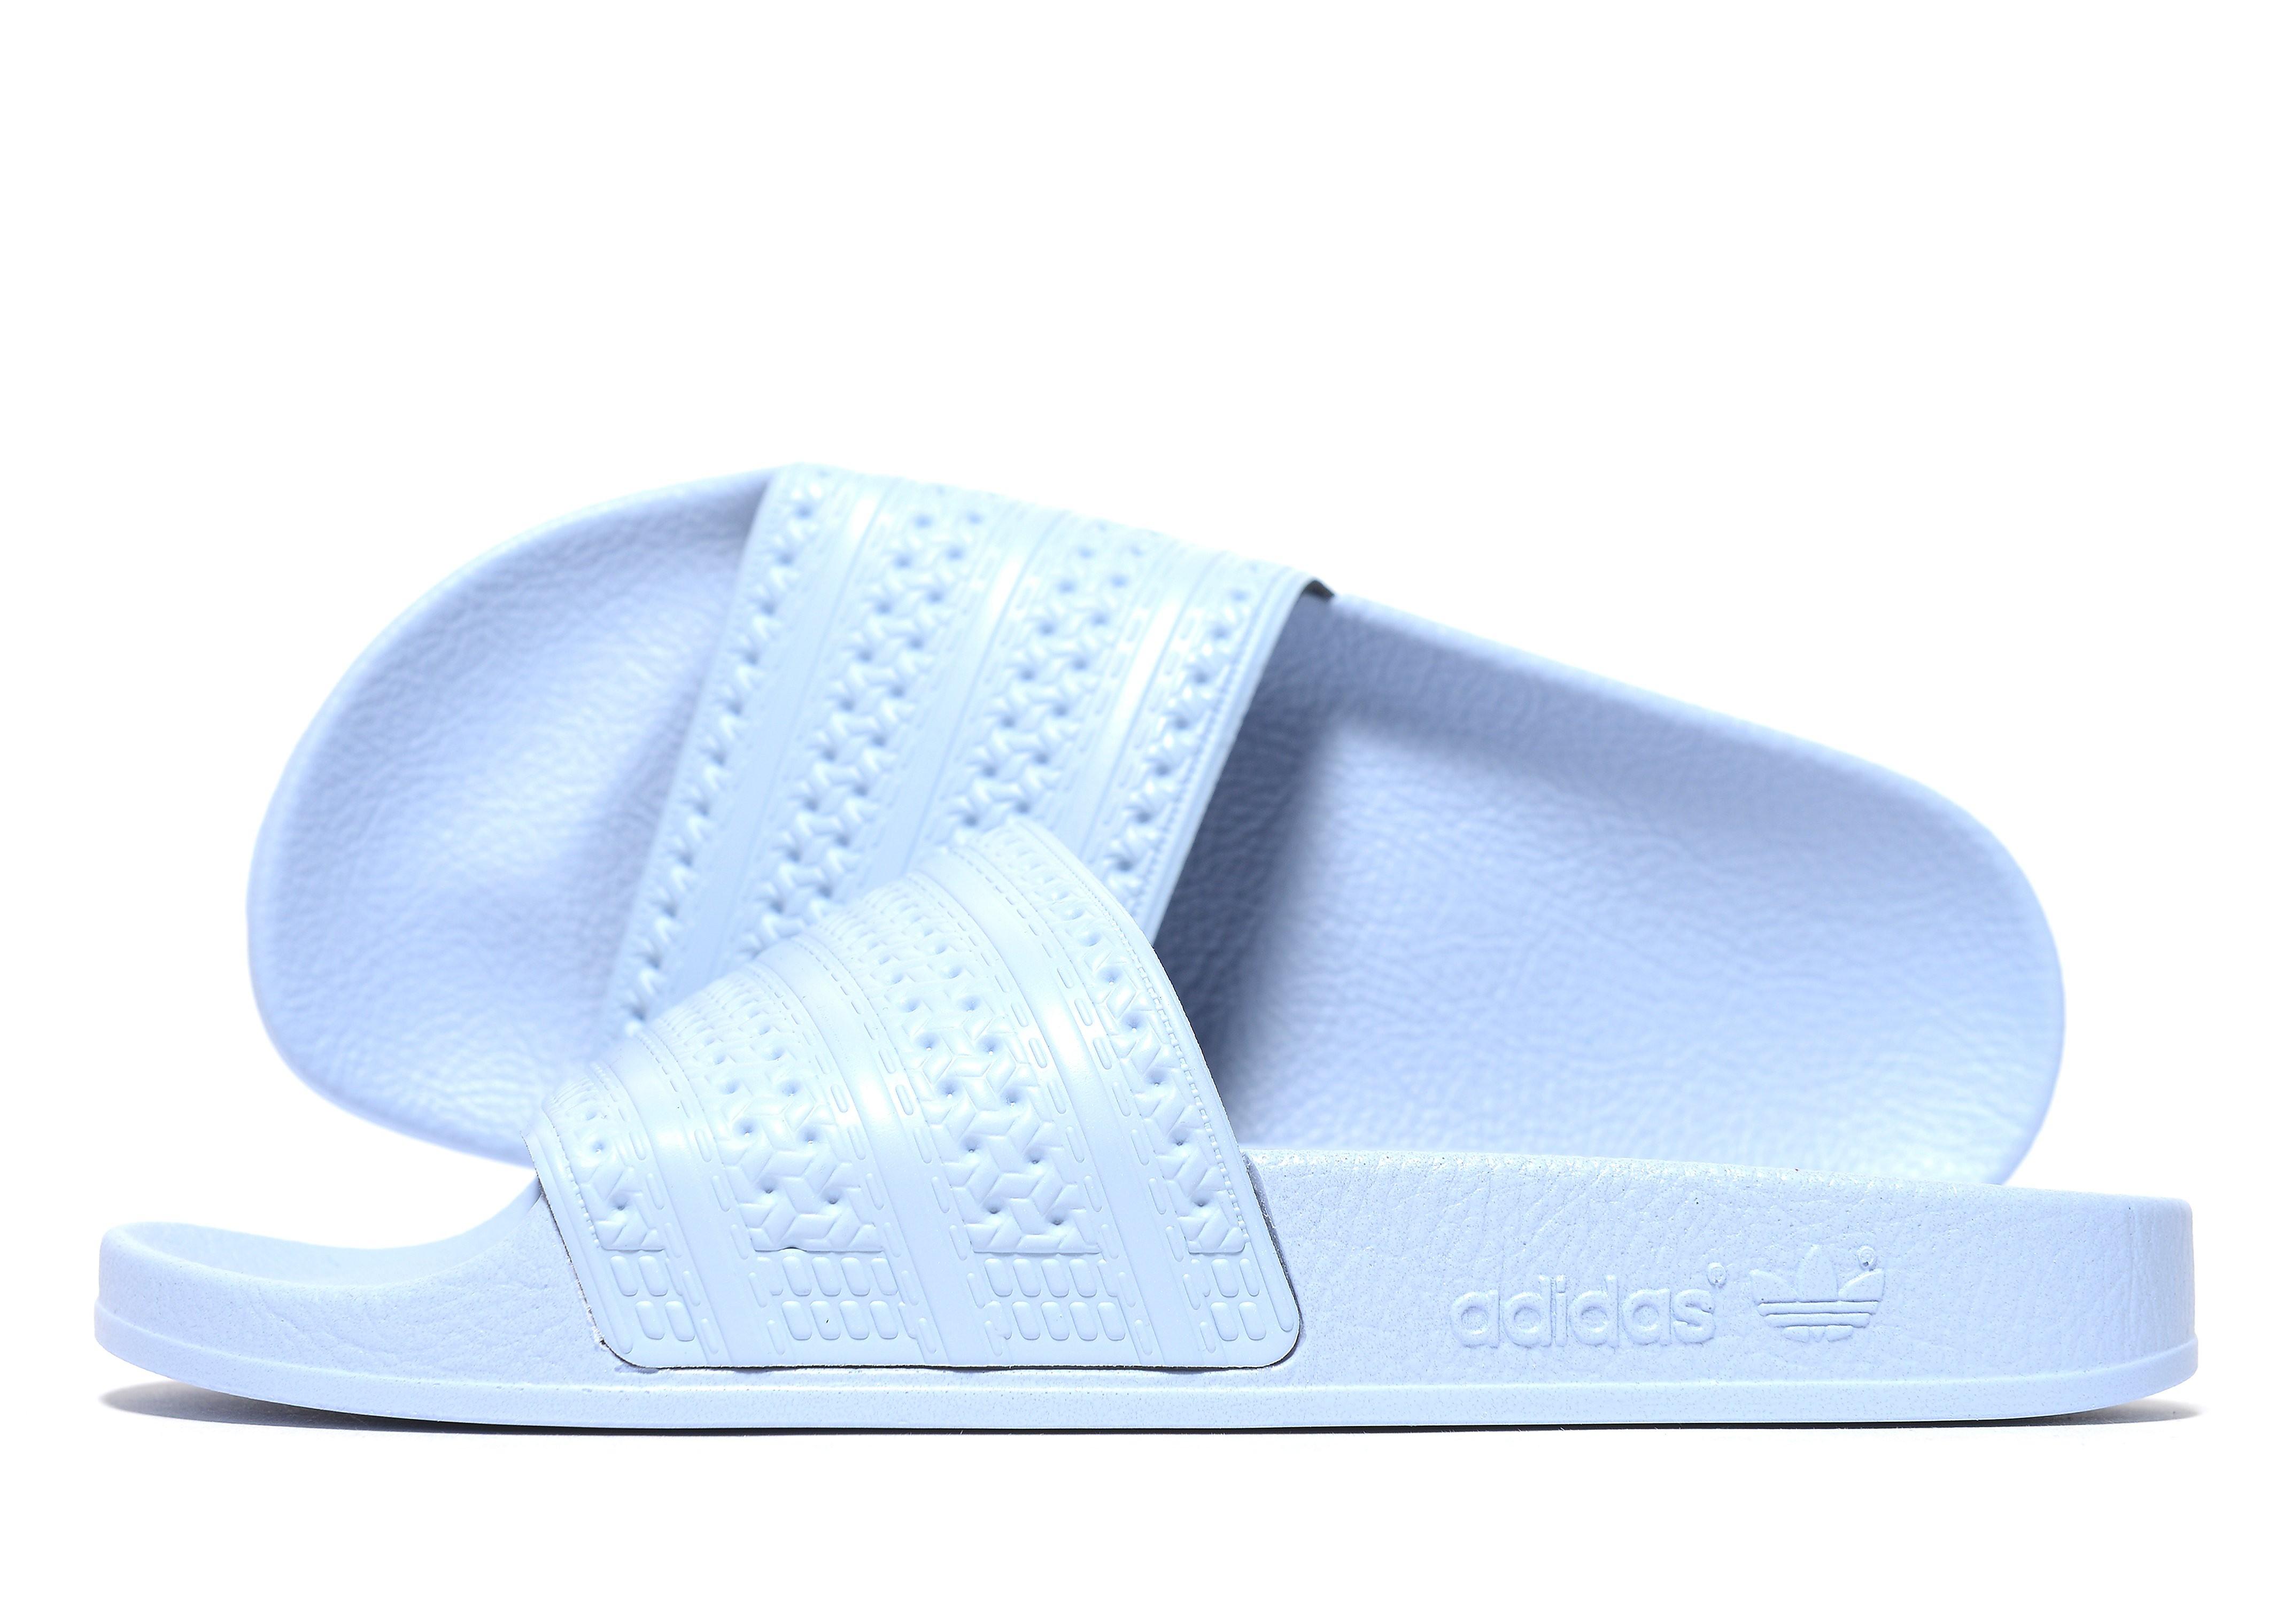 Adidas Adilette damessneaker blauw